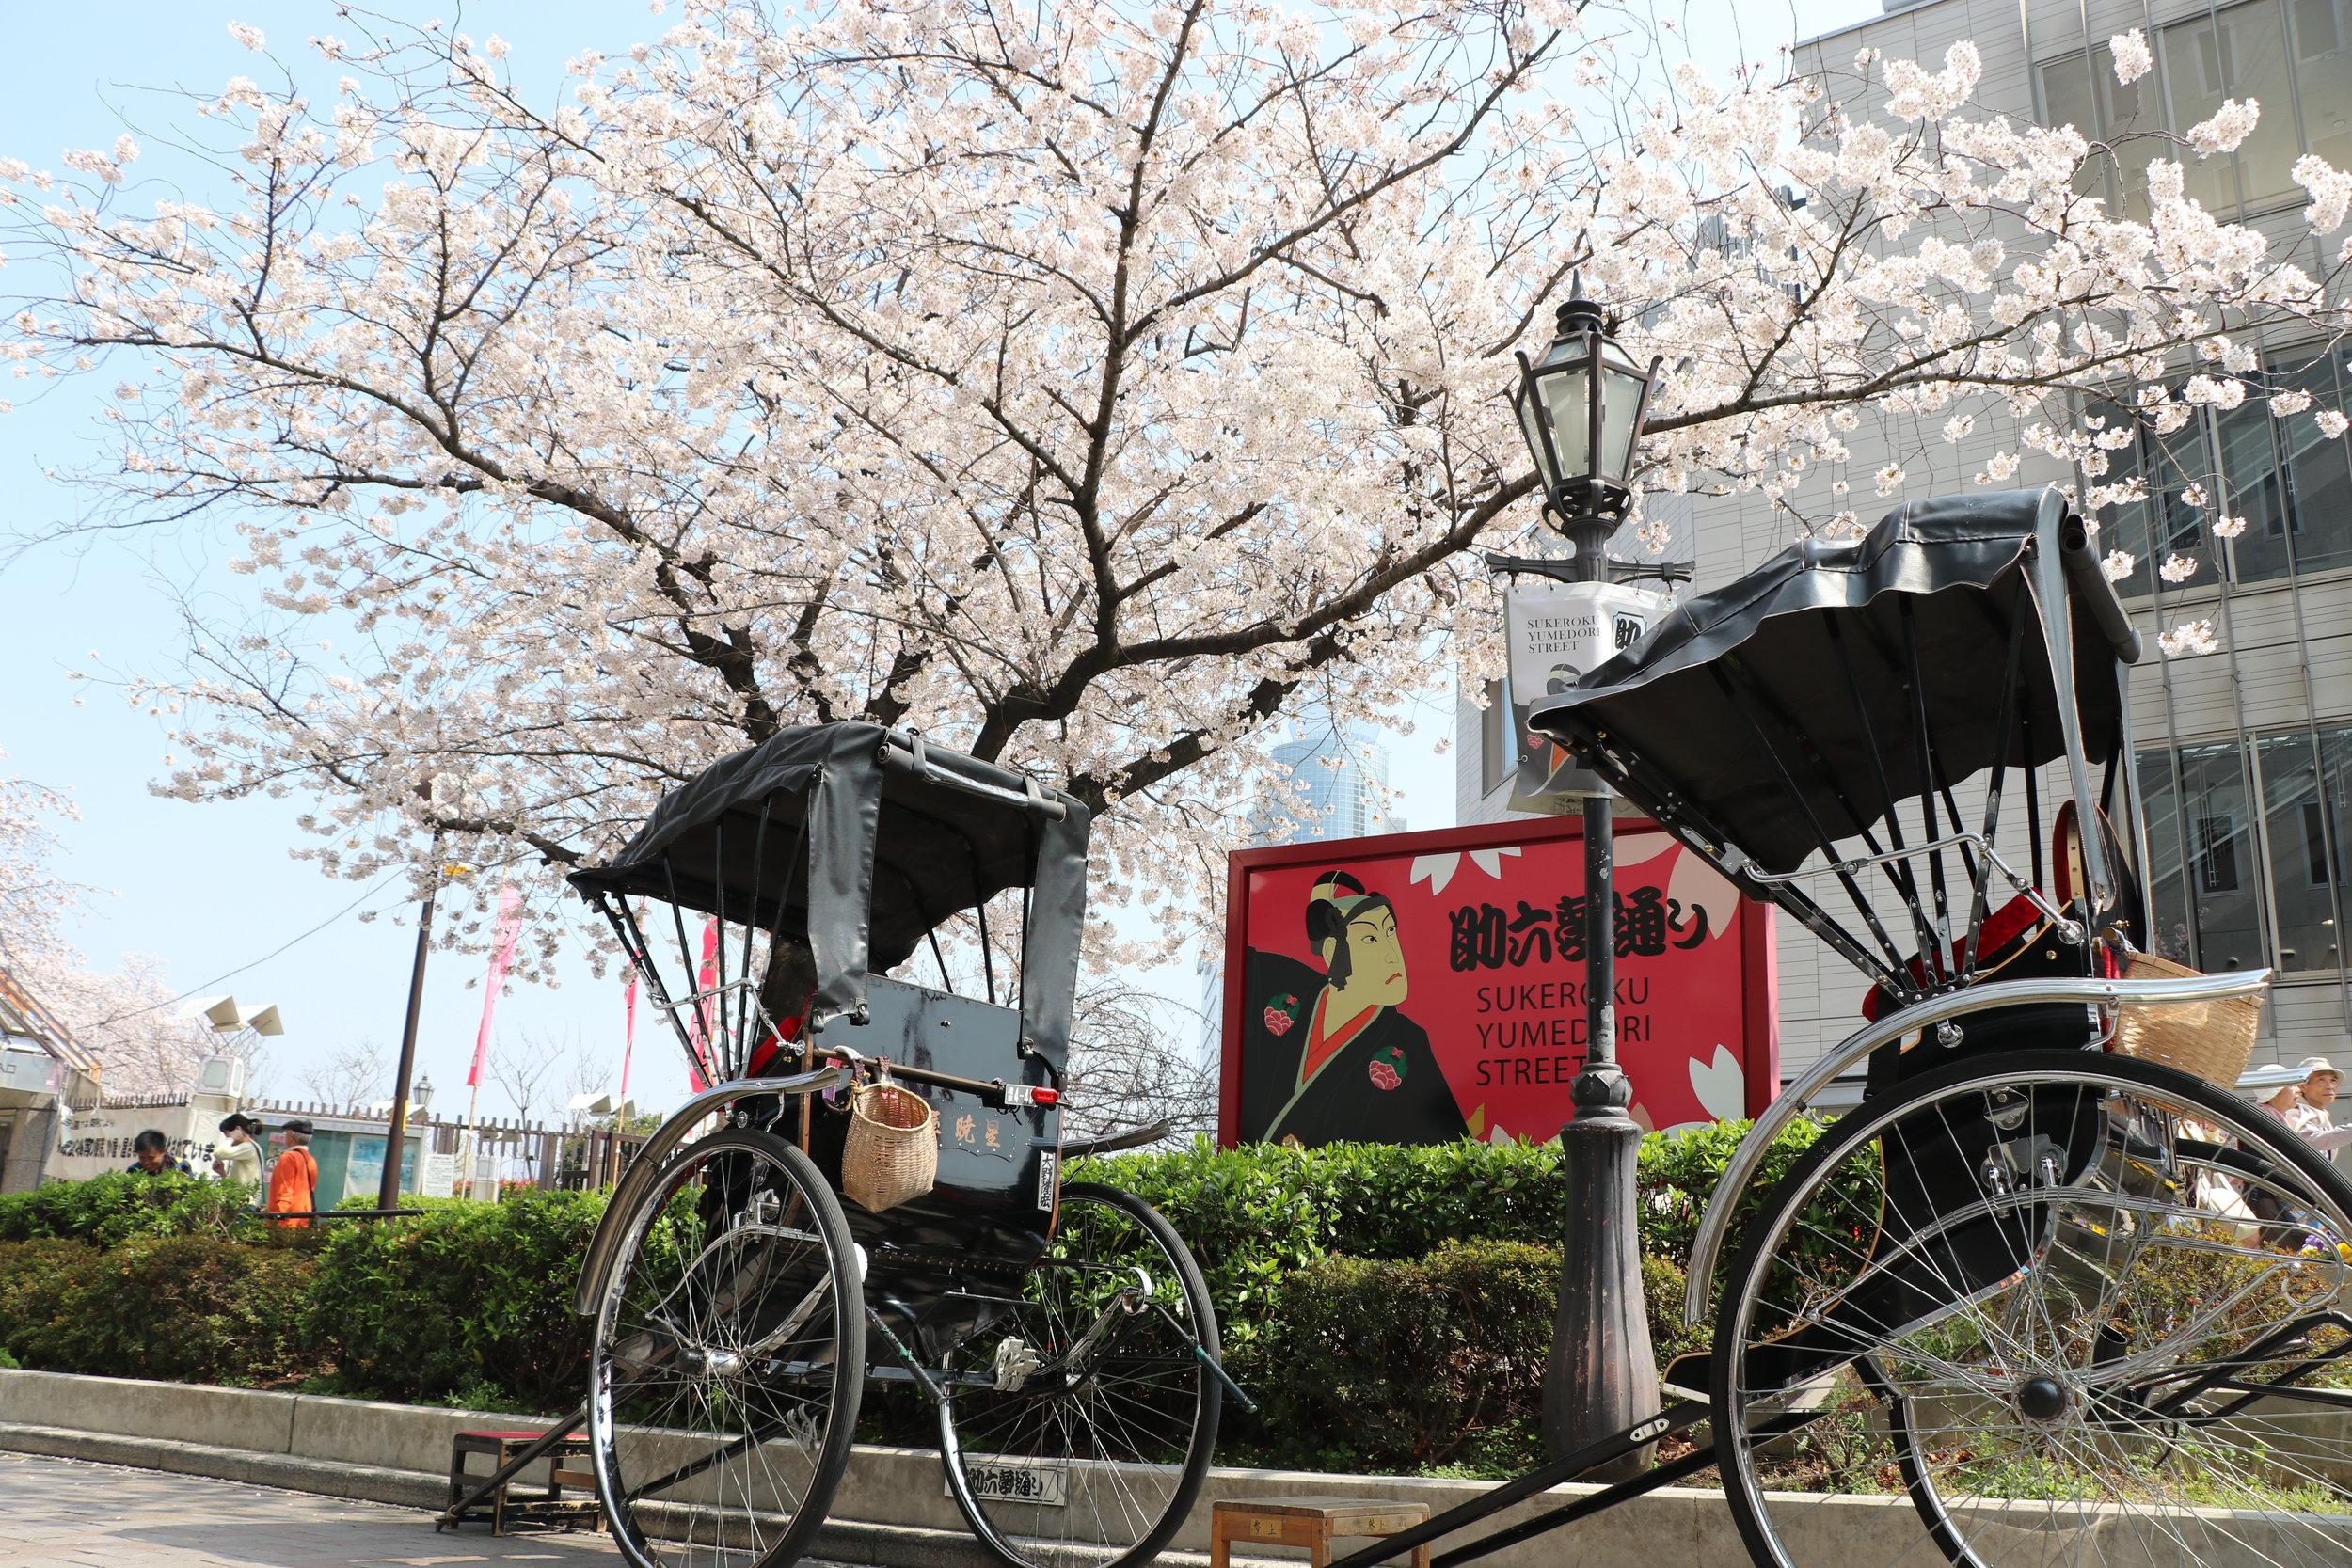 Top 10 Cherry Blossom Tokyo Spots Sumida River